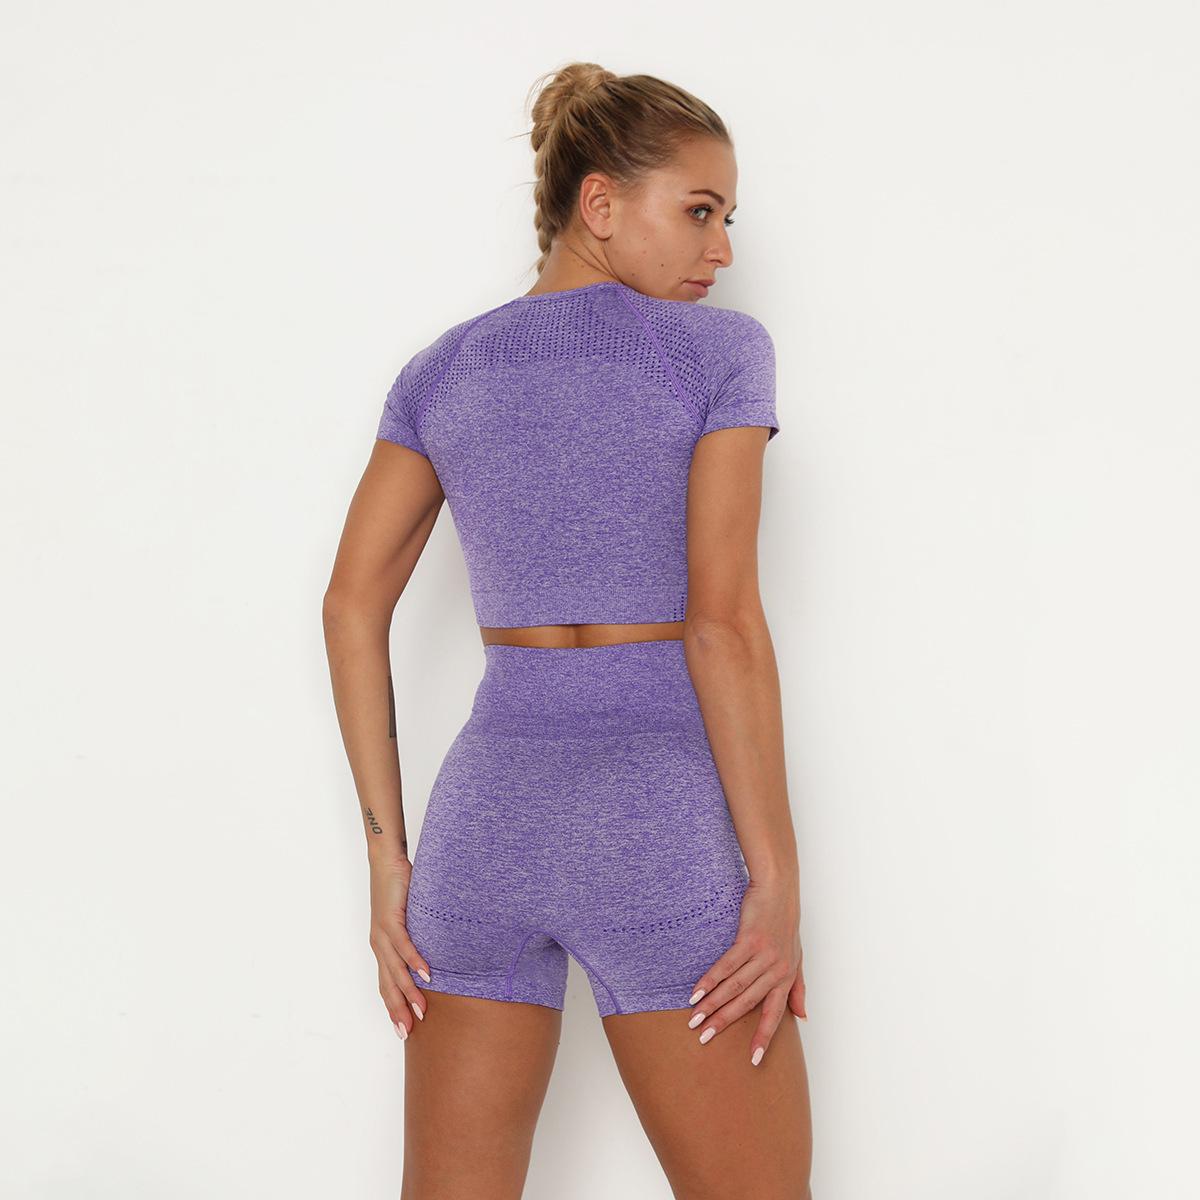 short-sleeved seamless knitted high waist hip tight shorts set NSLX8996